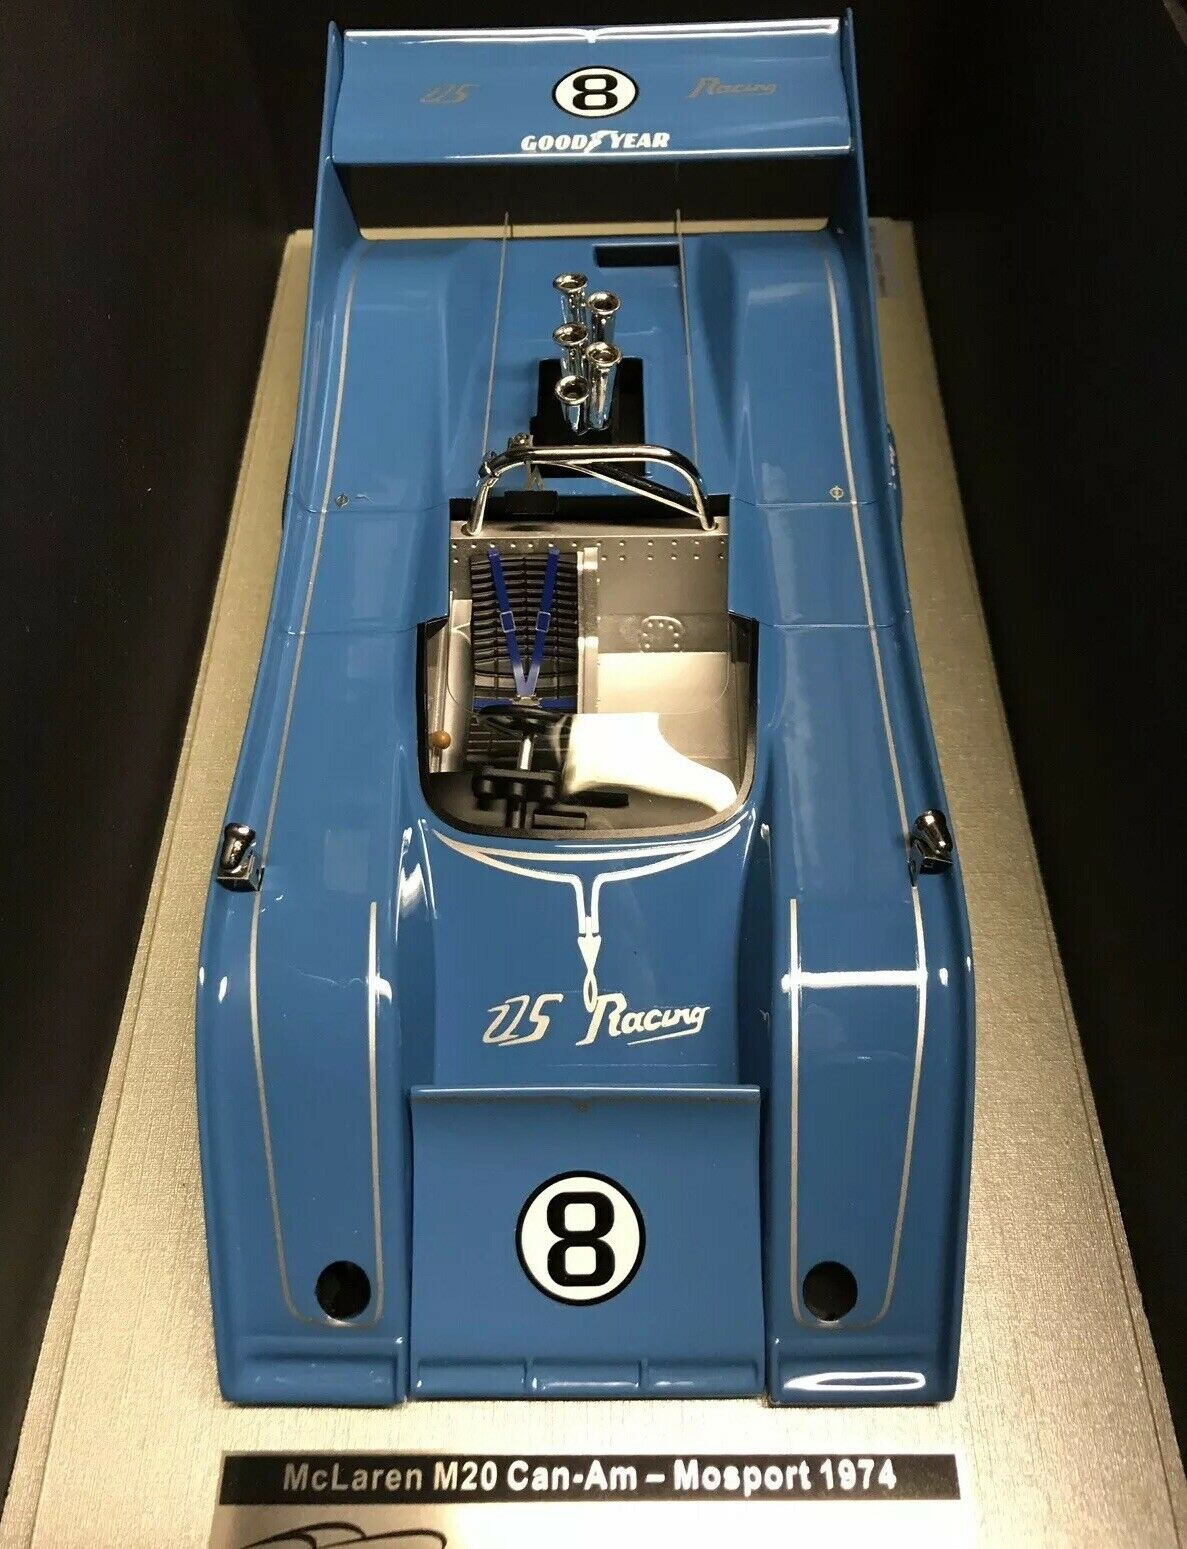 Tecnomodel 1974 McLaren M20 Mosport Can-Am 1 18 Nuevo En Caja +